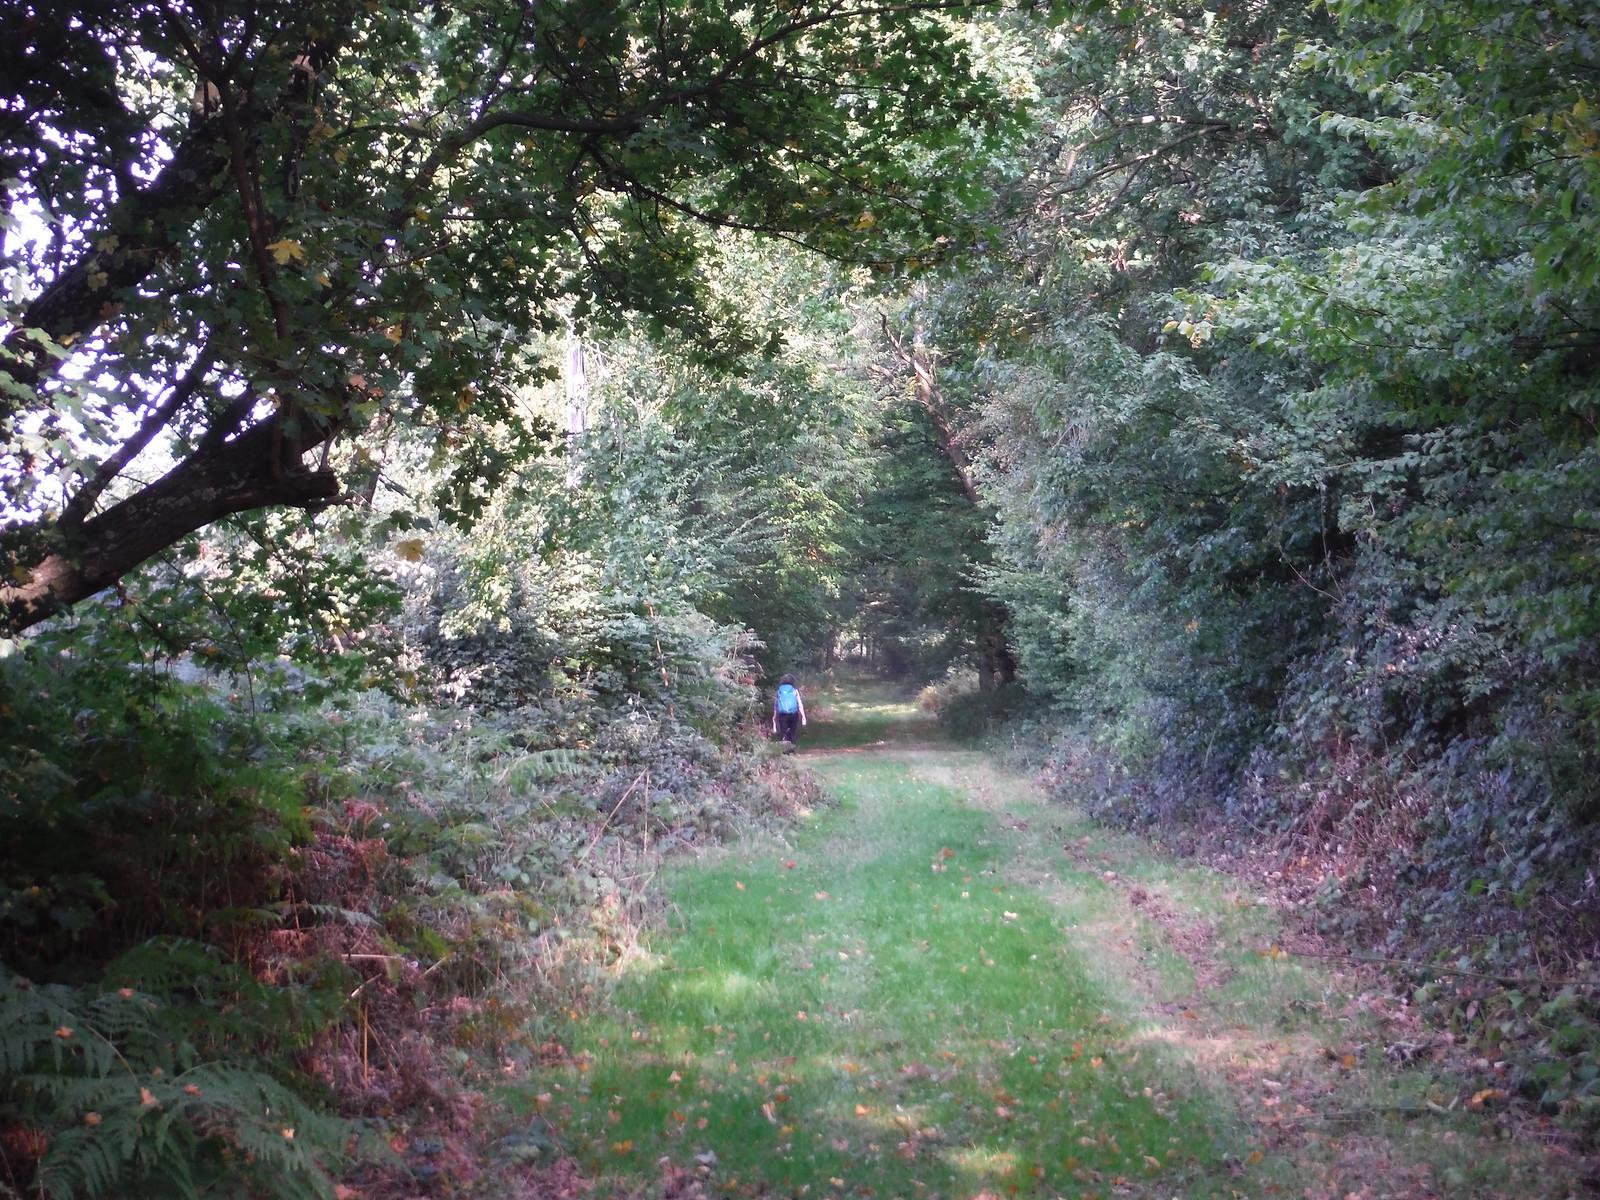 Between Trees, east of East Hanningfield SWC Walk 159 South Woodham Ferrers to North Fambridge